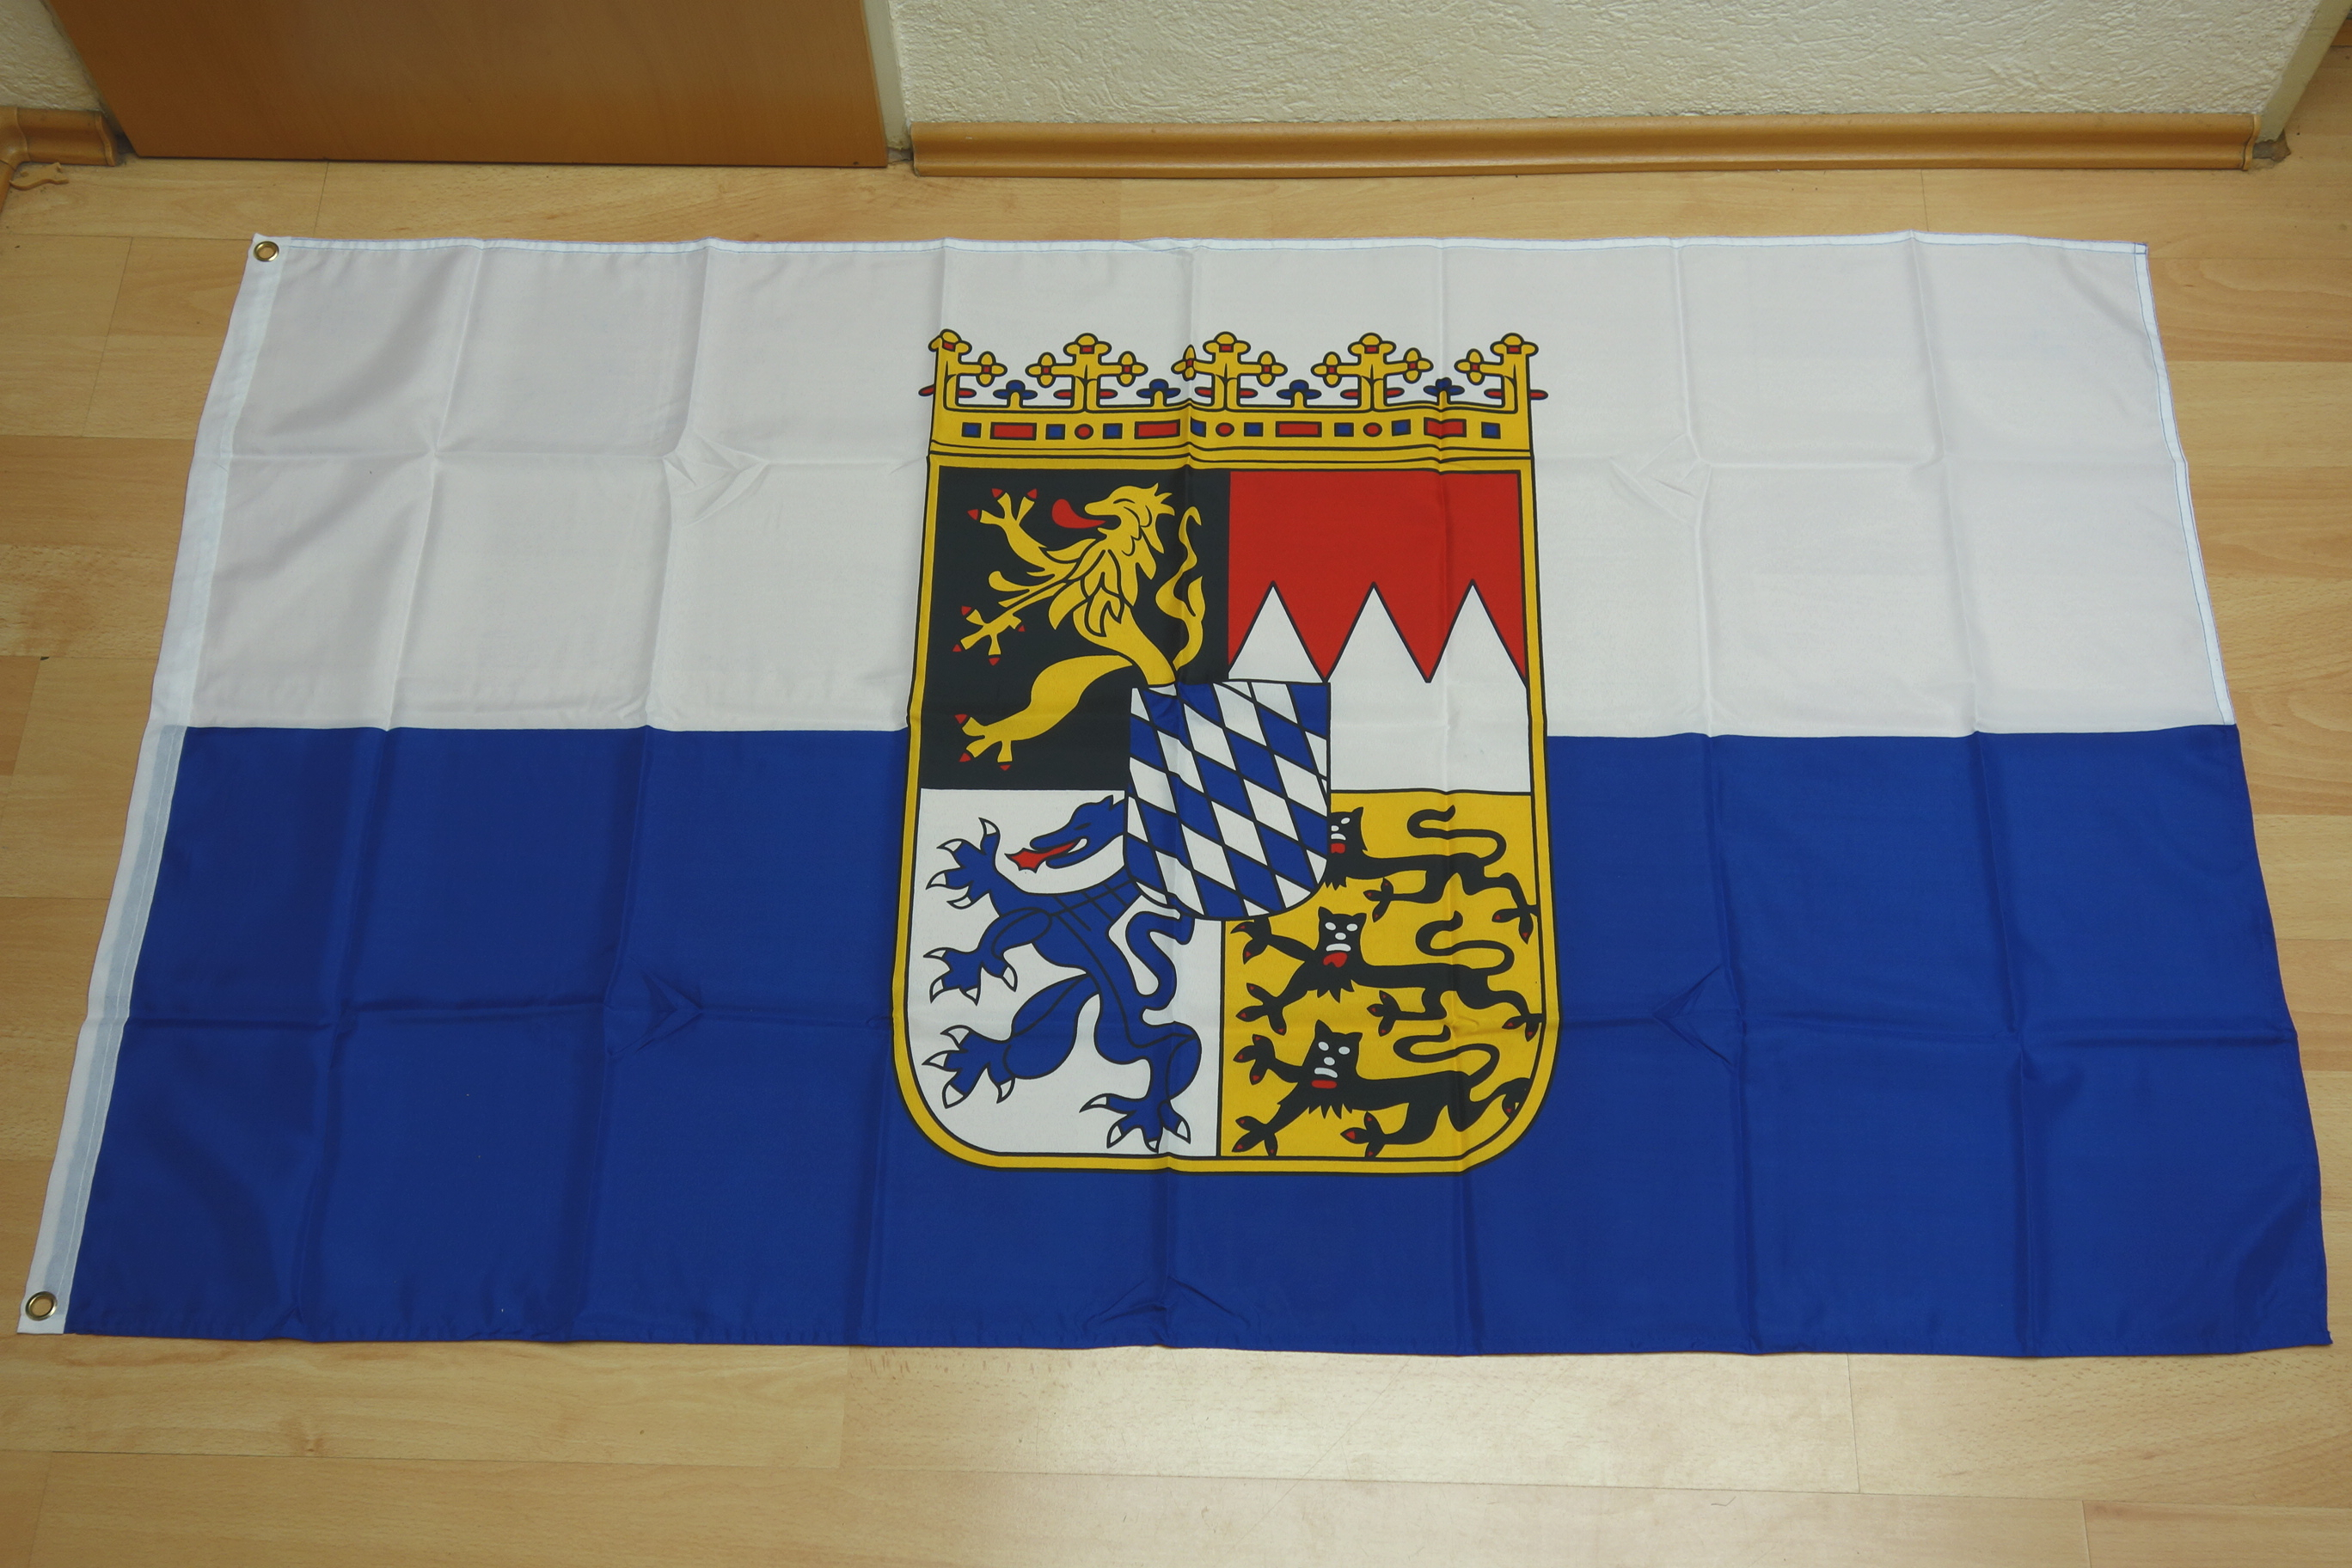 Bayern Landesdienstflagge - 90 x 150 cm